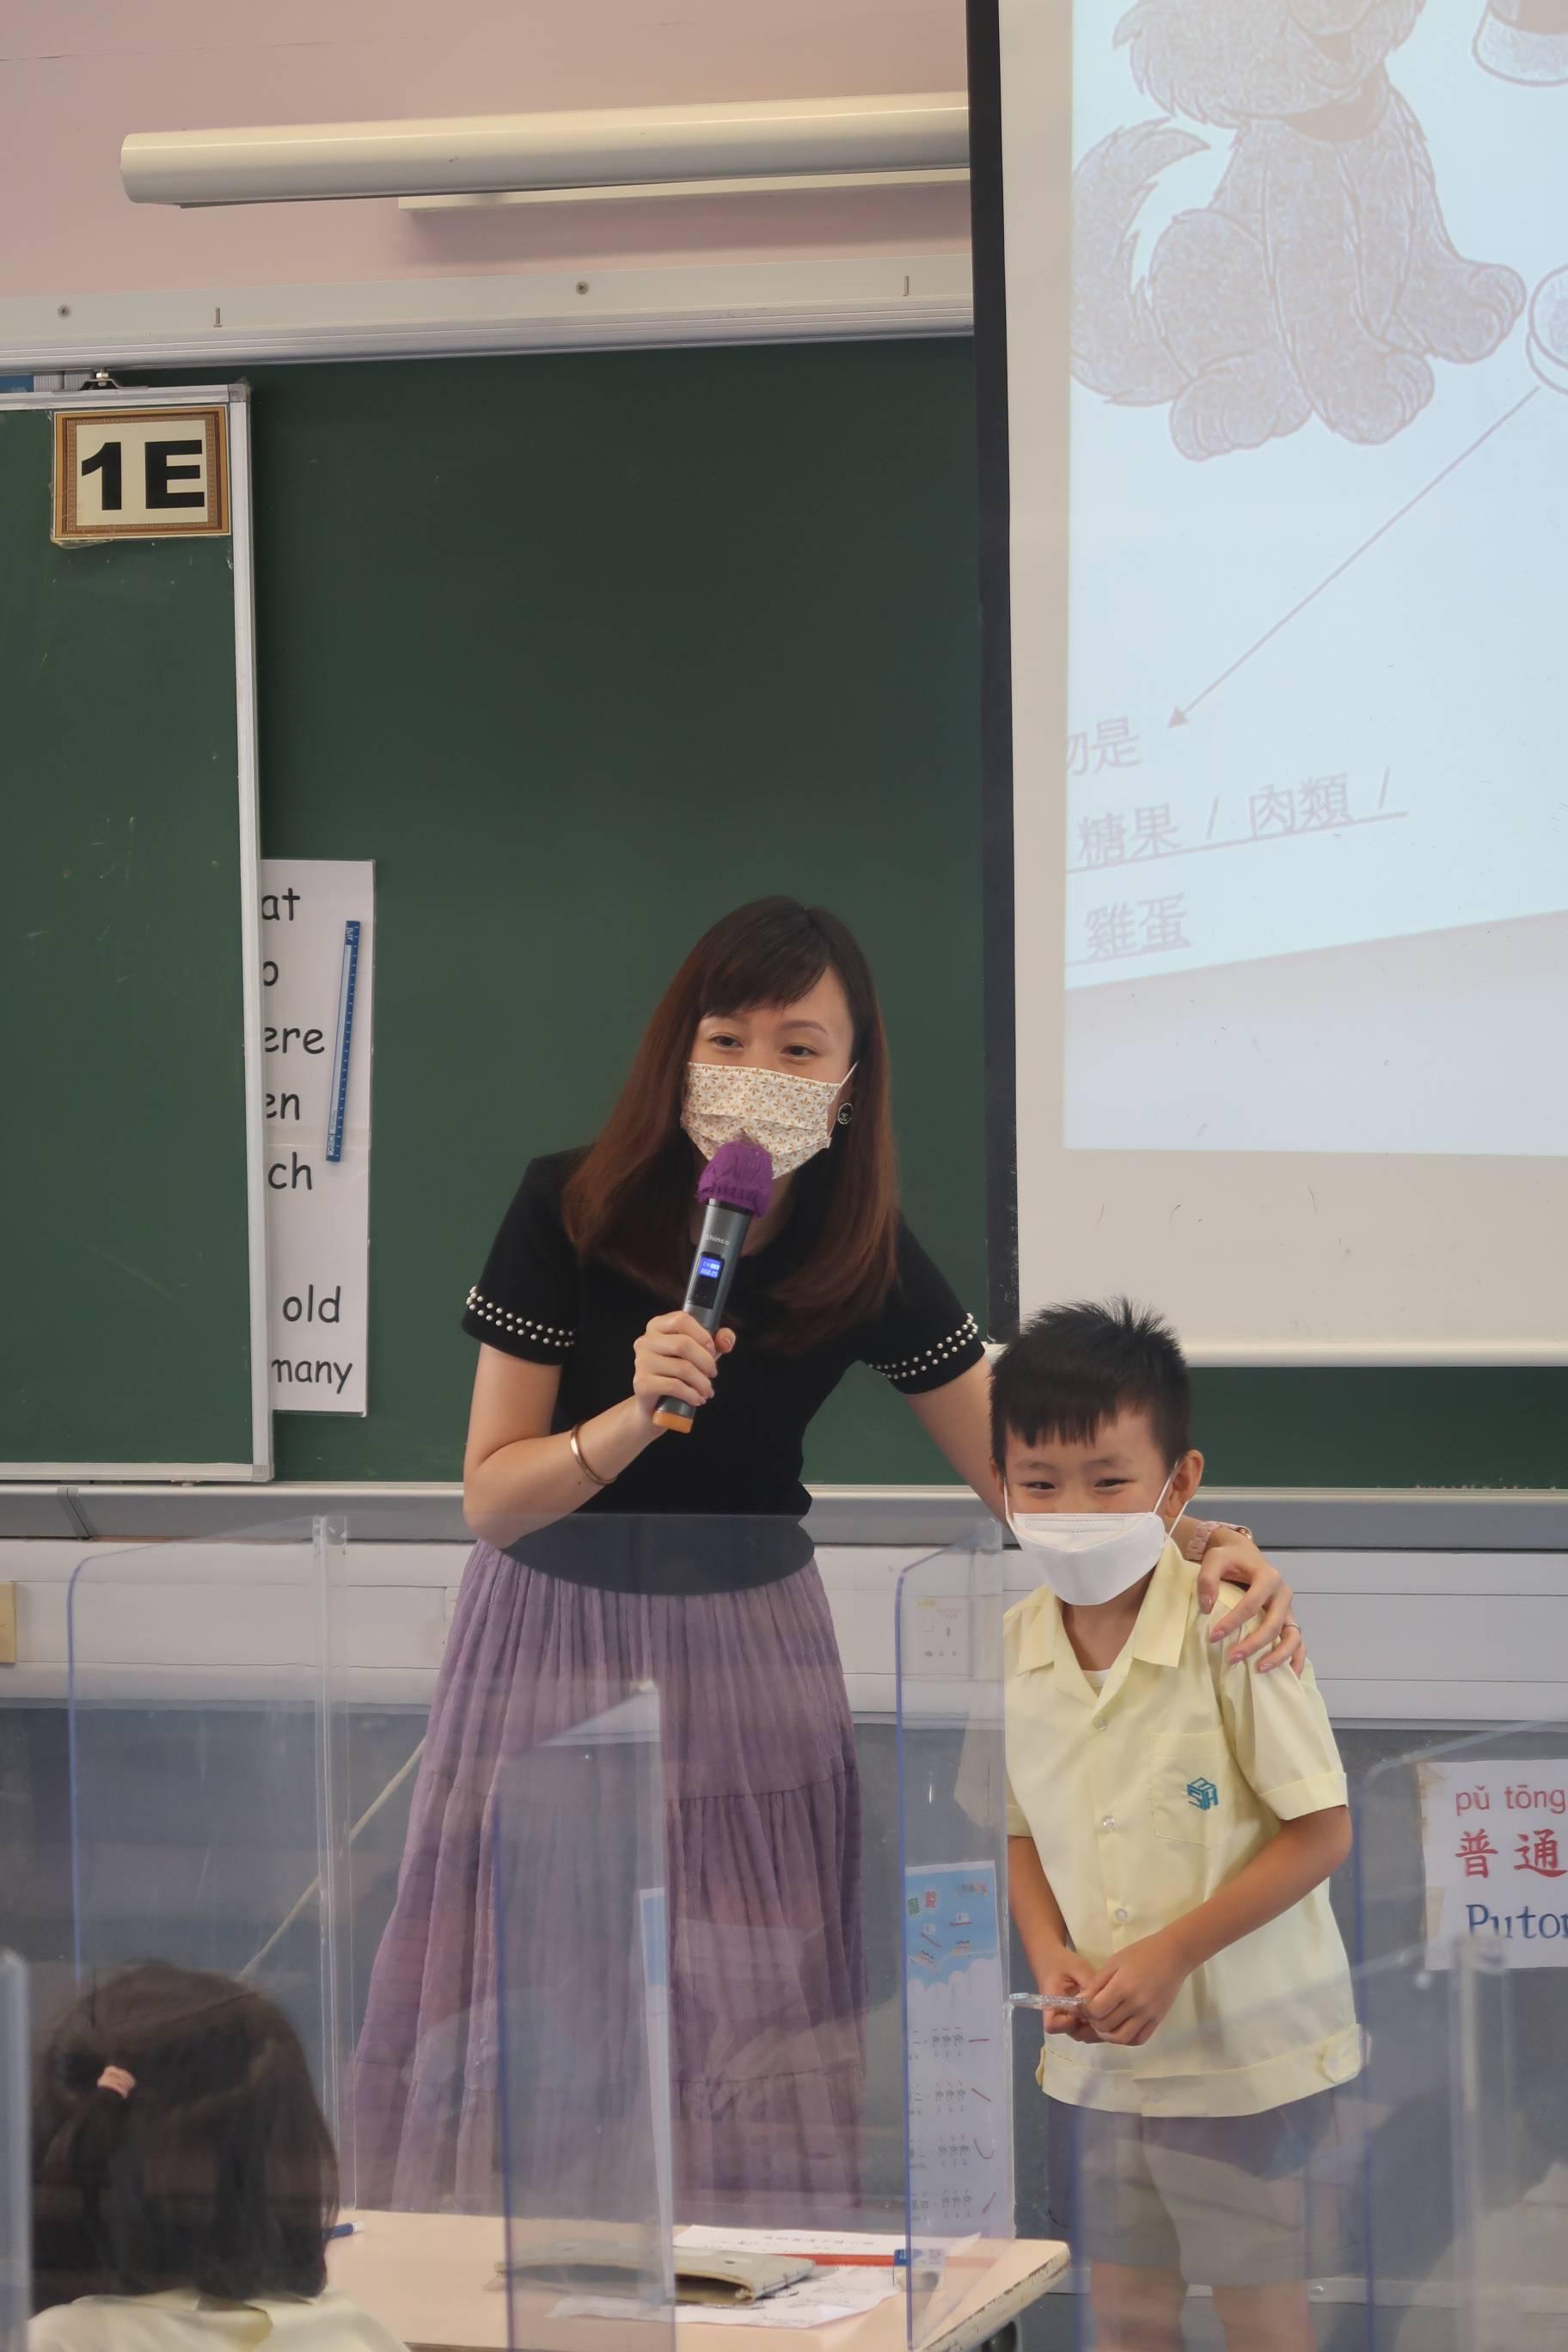 https://syh.edu.hk/sites/default/files/img_6706_1.jpg